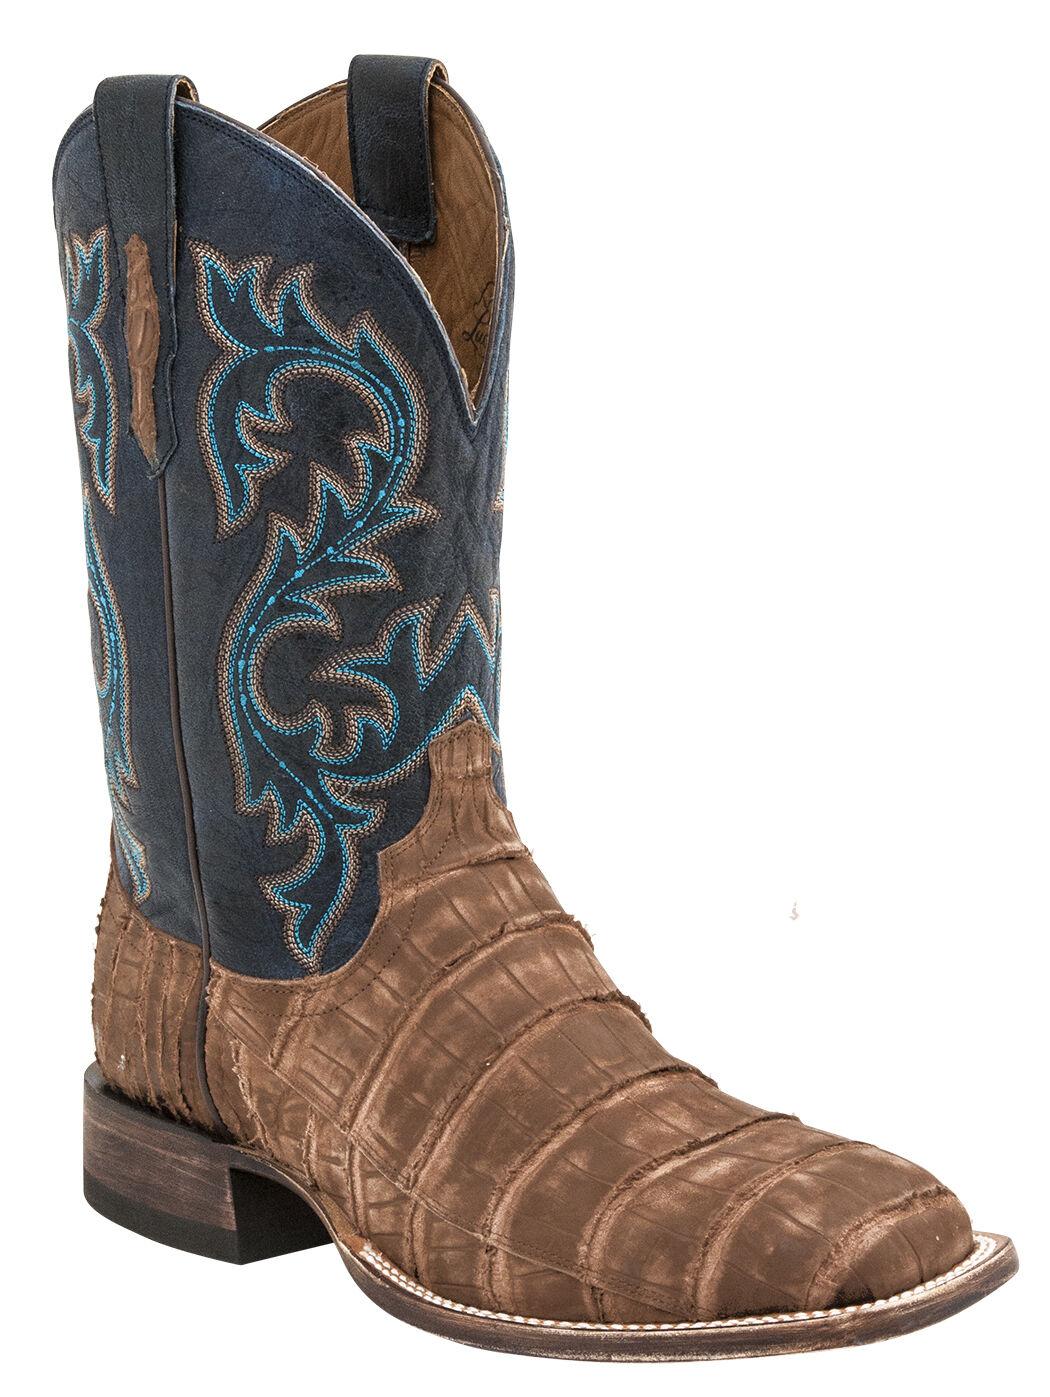 Clearance Cowboy Boots \u0026 Shoes - Sheplers